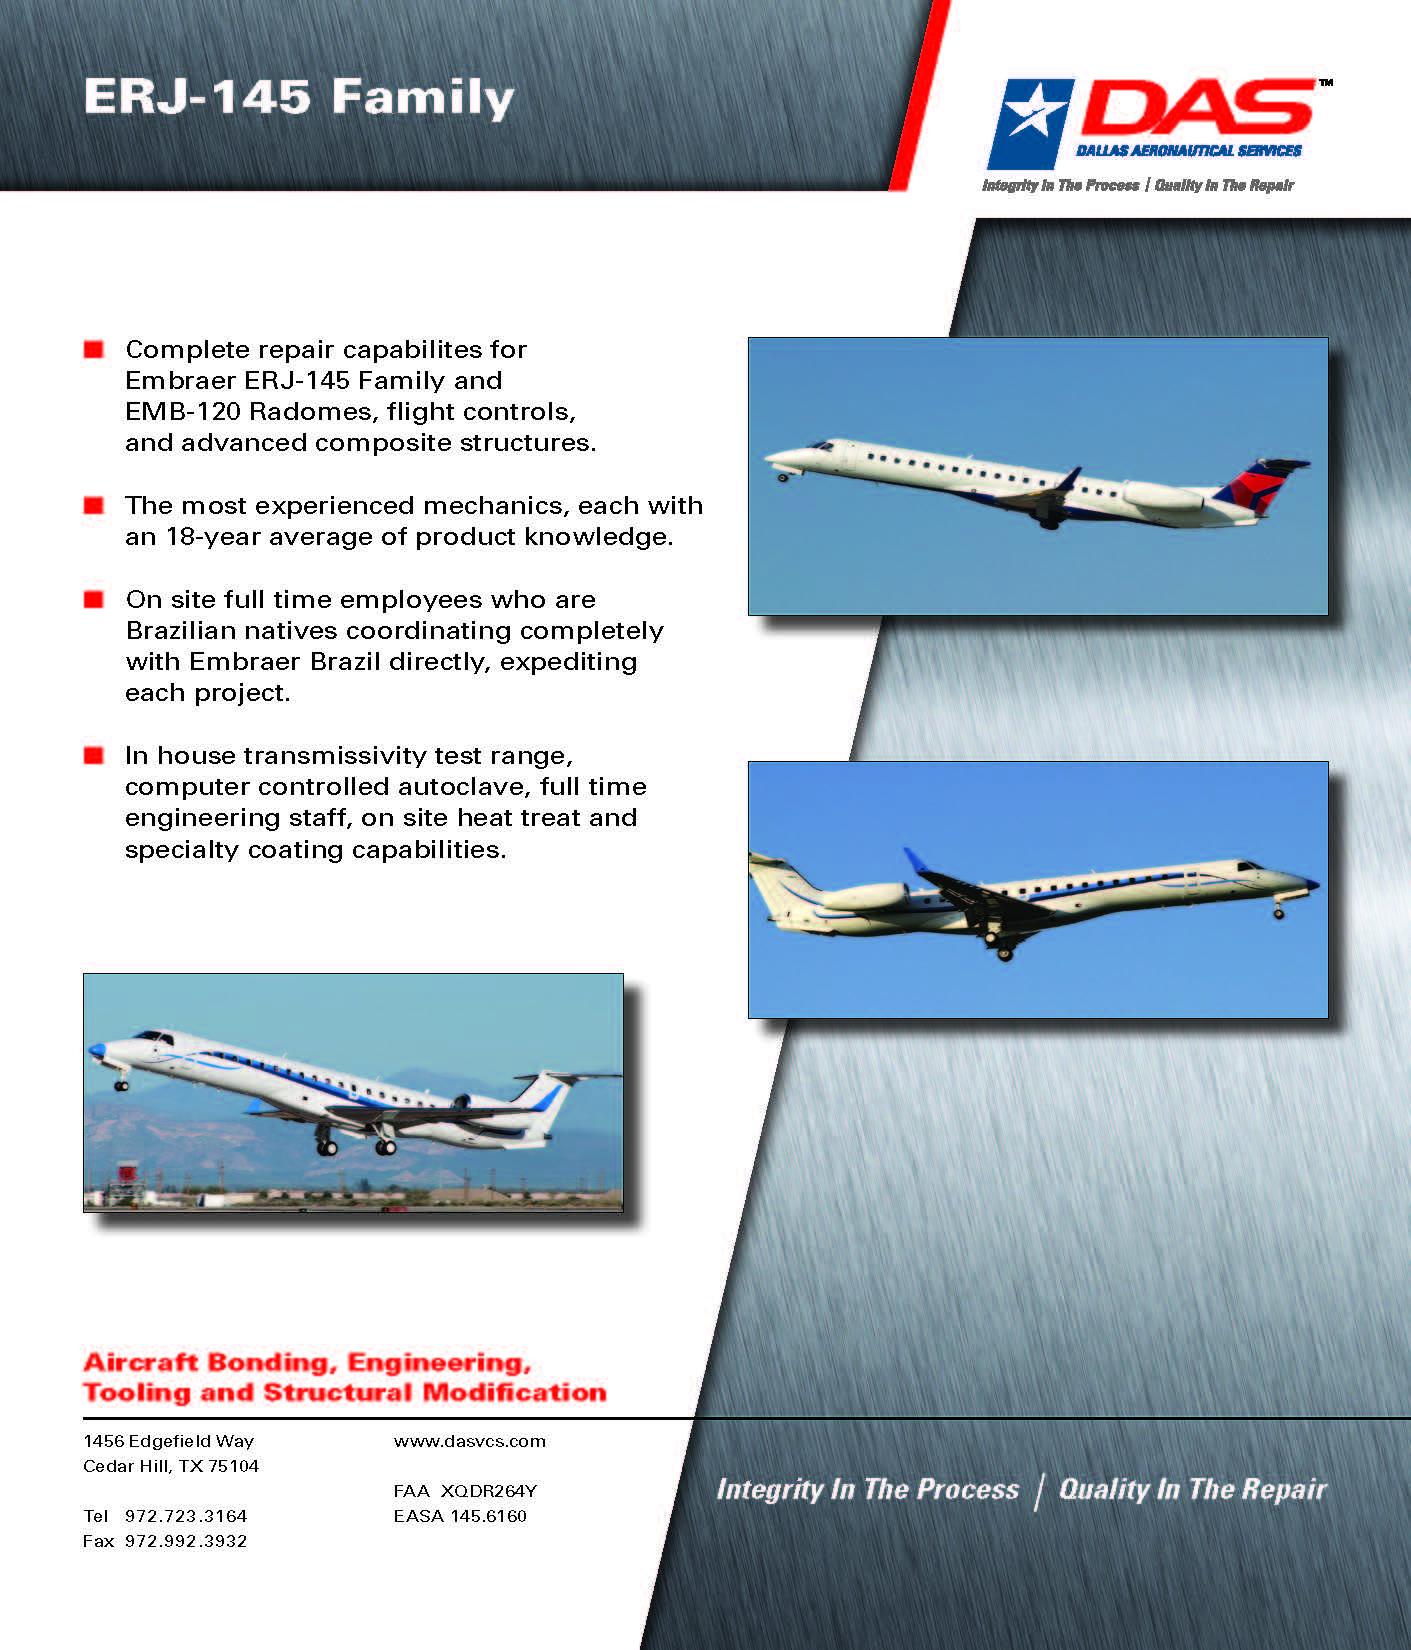 DAS-ERJ-145 sheet F4-LR corp.jpg